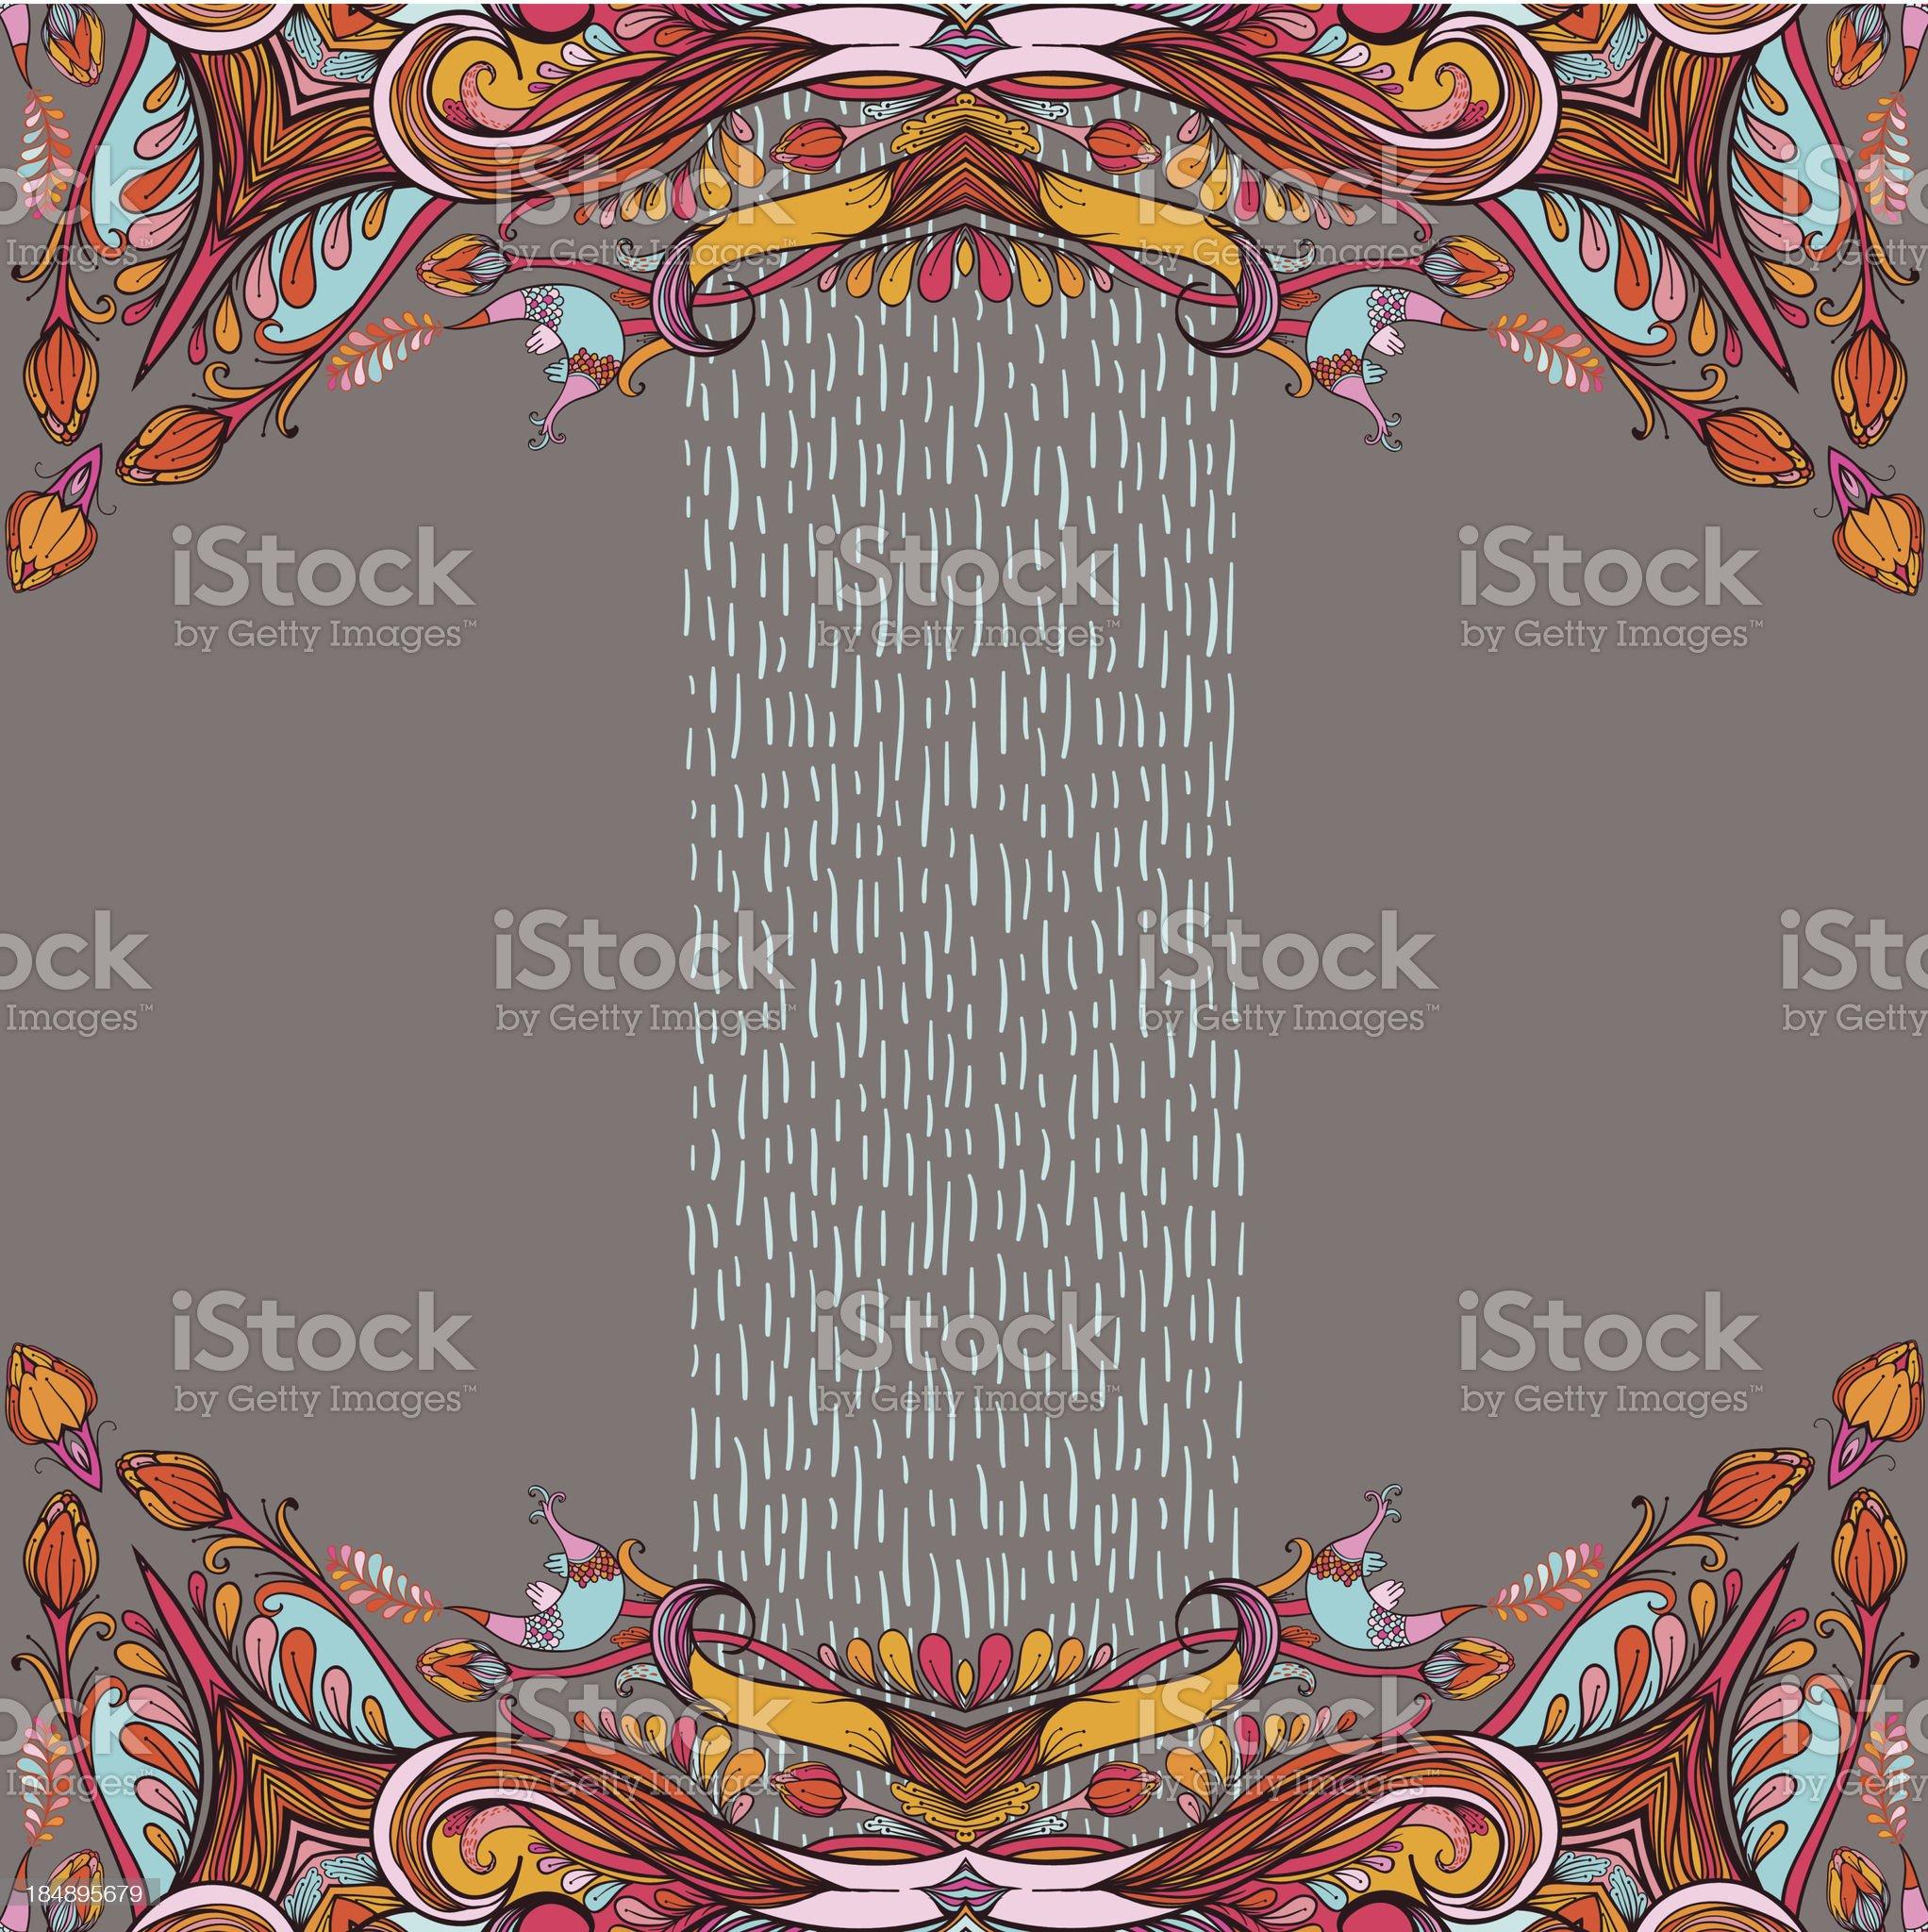 Soul of autumn royalty-free stock vector art